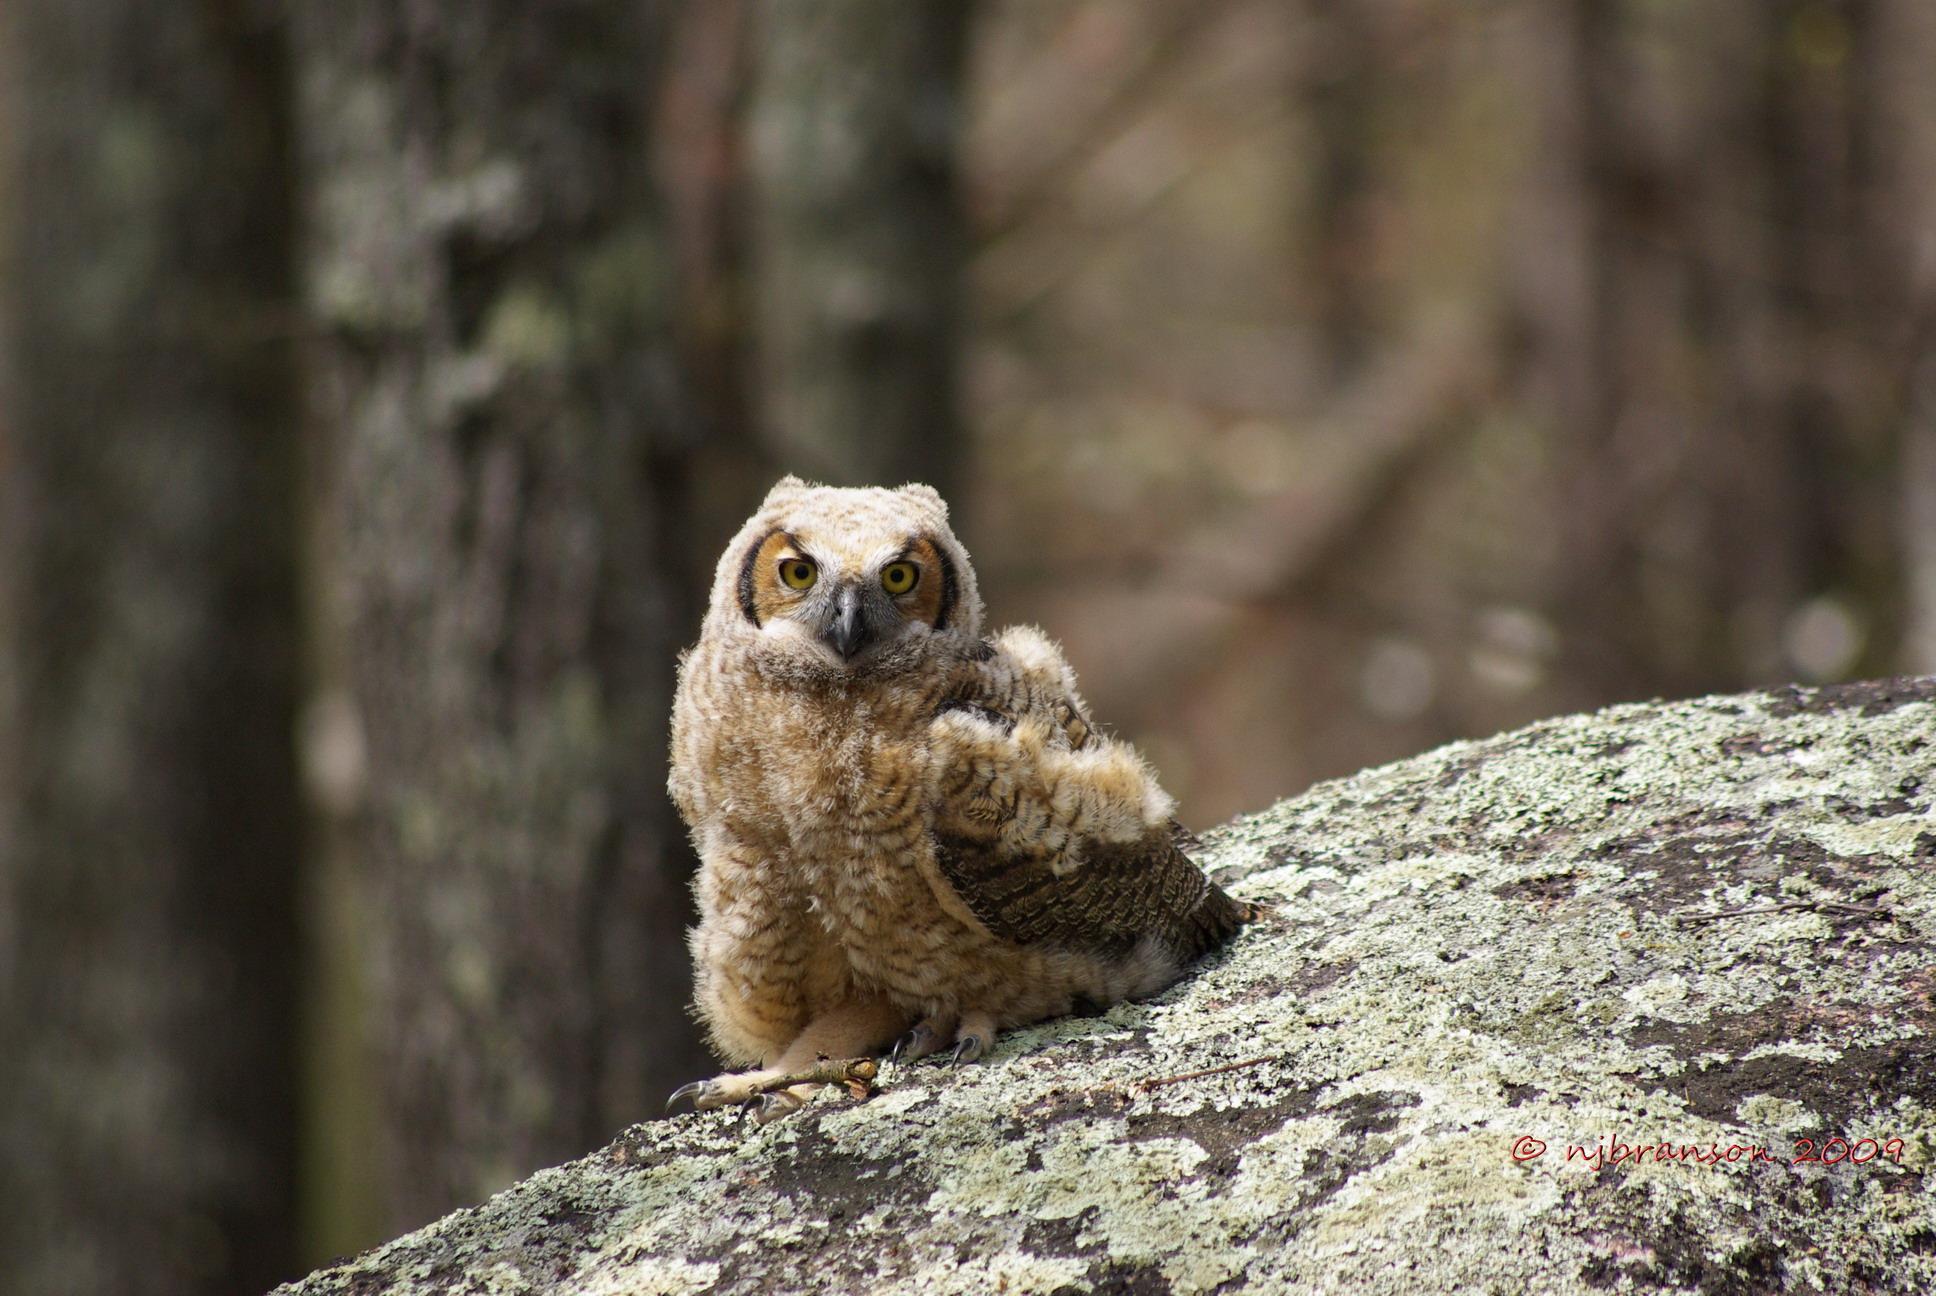 Baby horned owl photo